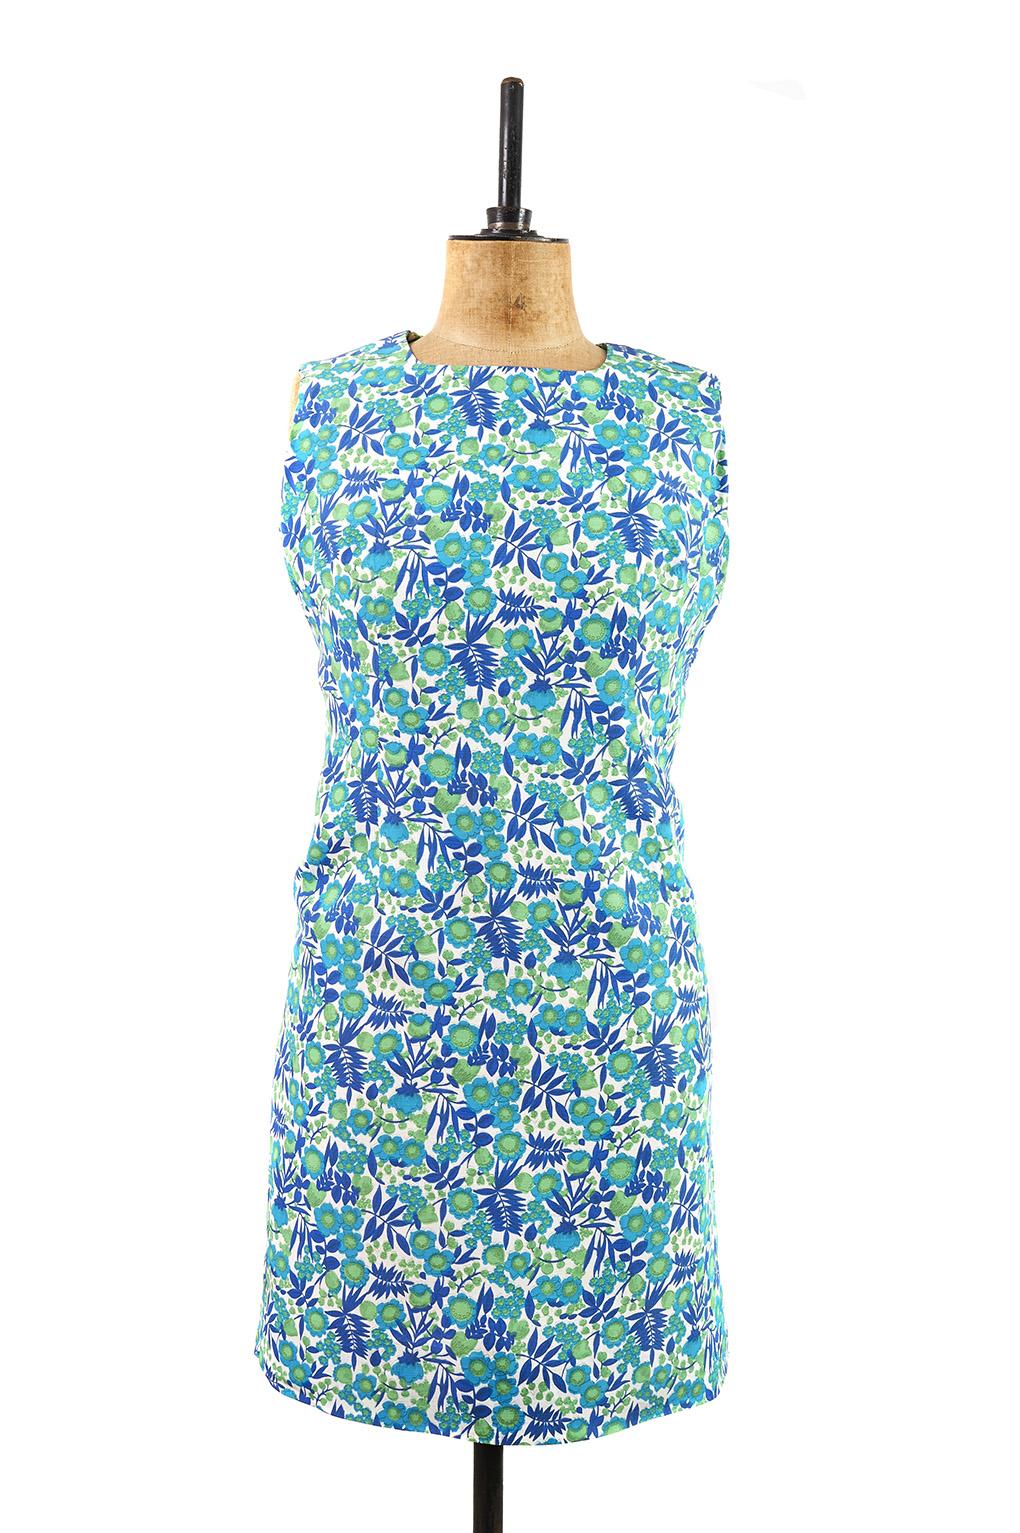 Bold Floral \'60s Shift Dress   Size 14 - Margot & Hesse